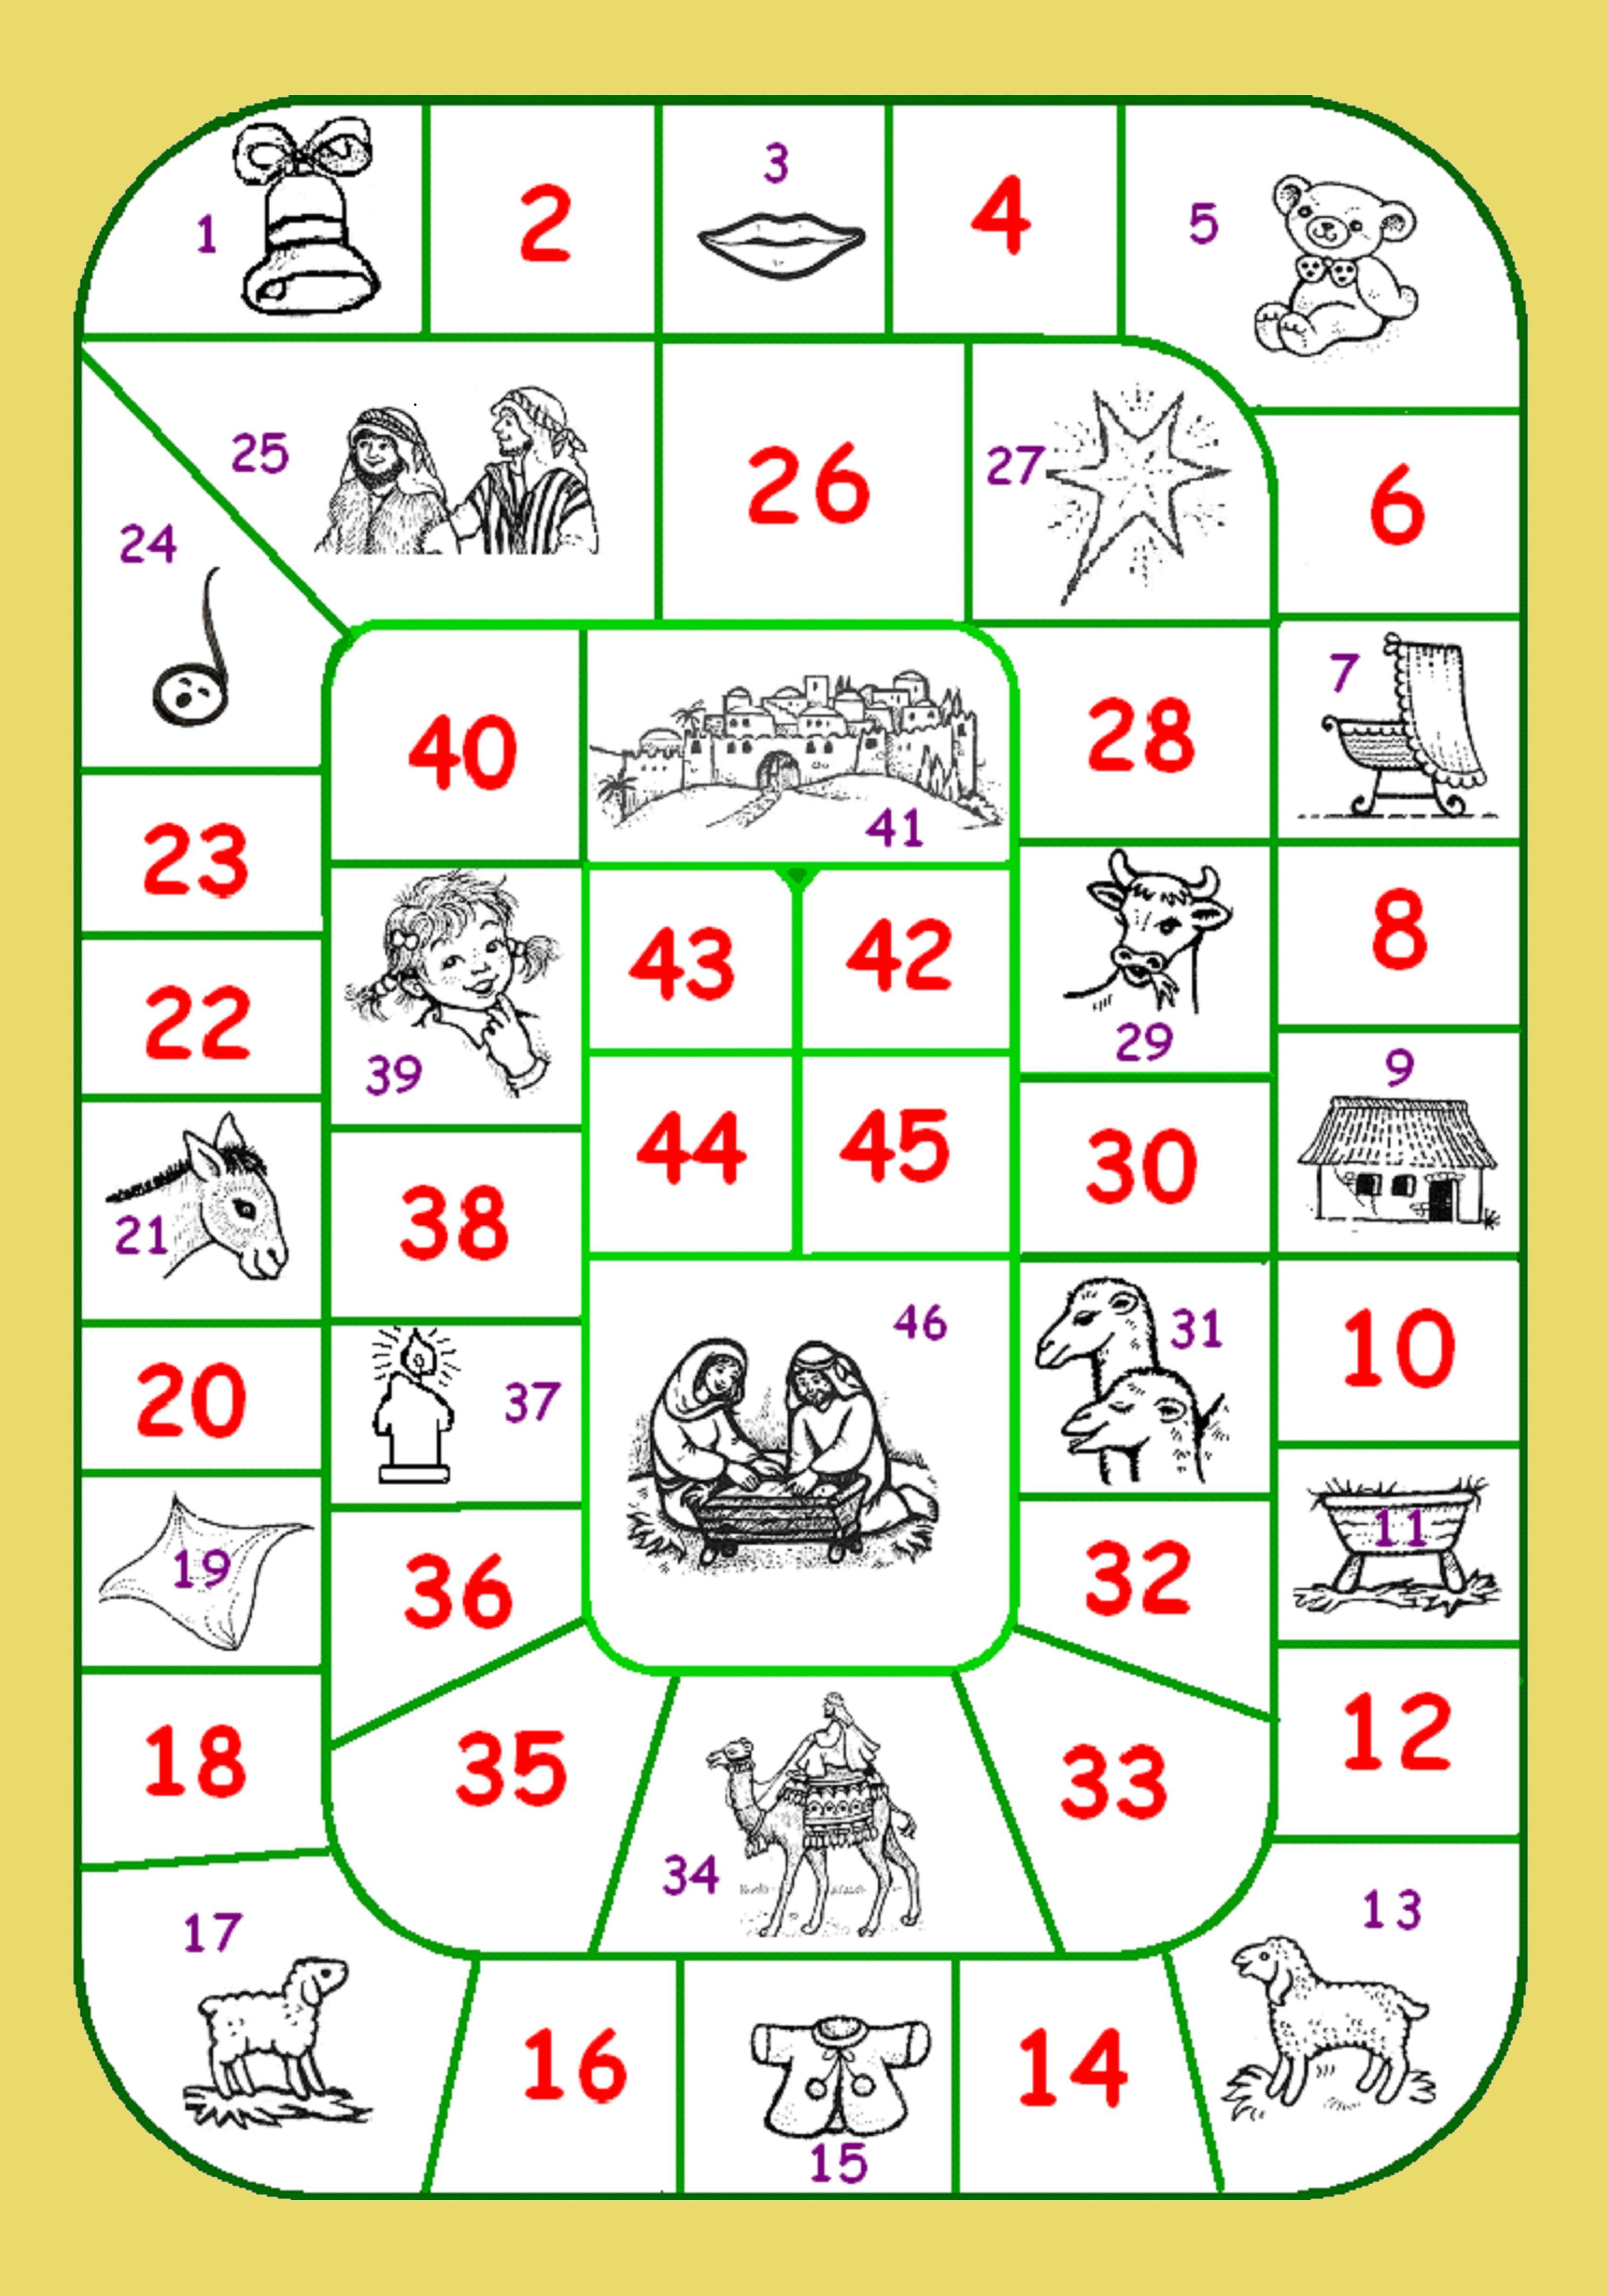 kerst ganzenbordspel - www.bijbelidee.nl | kerstknutselideeen ...